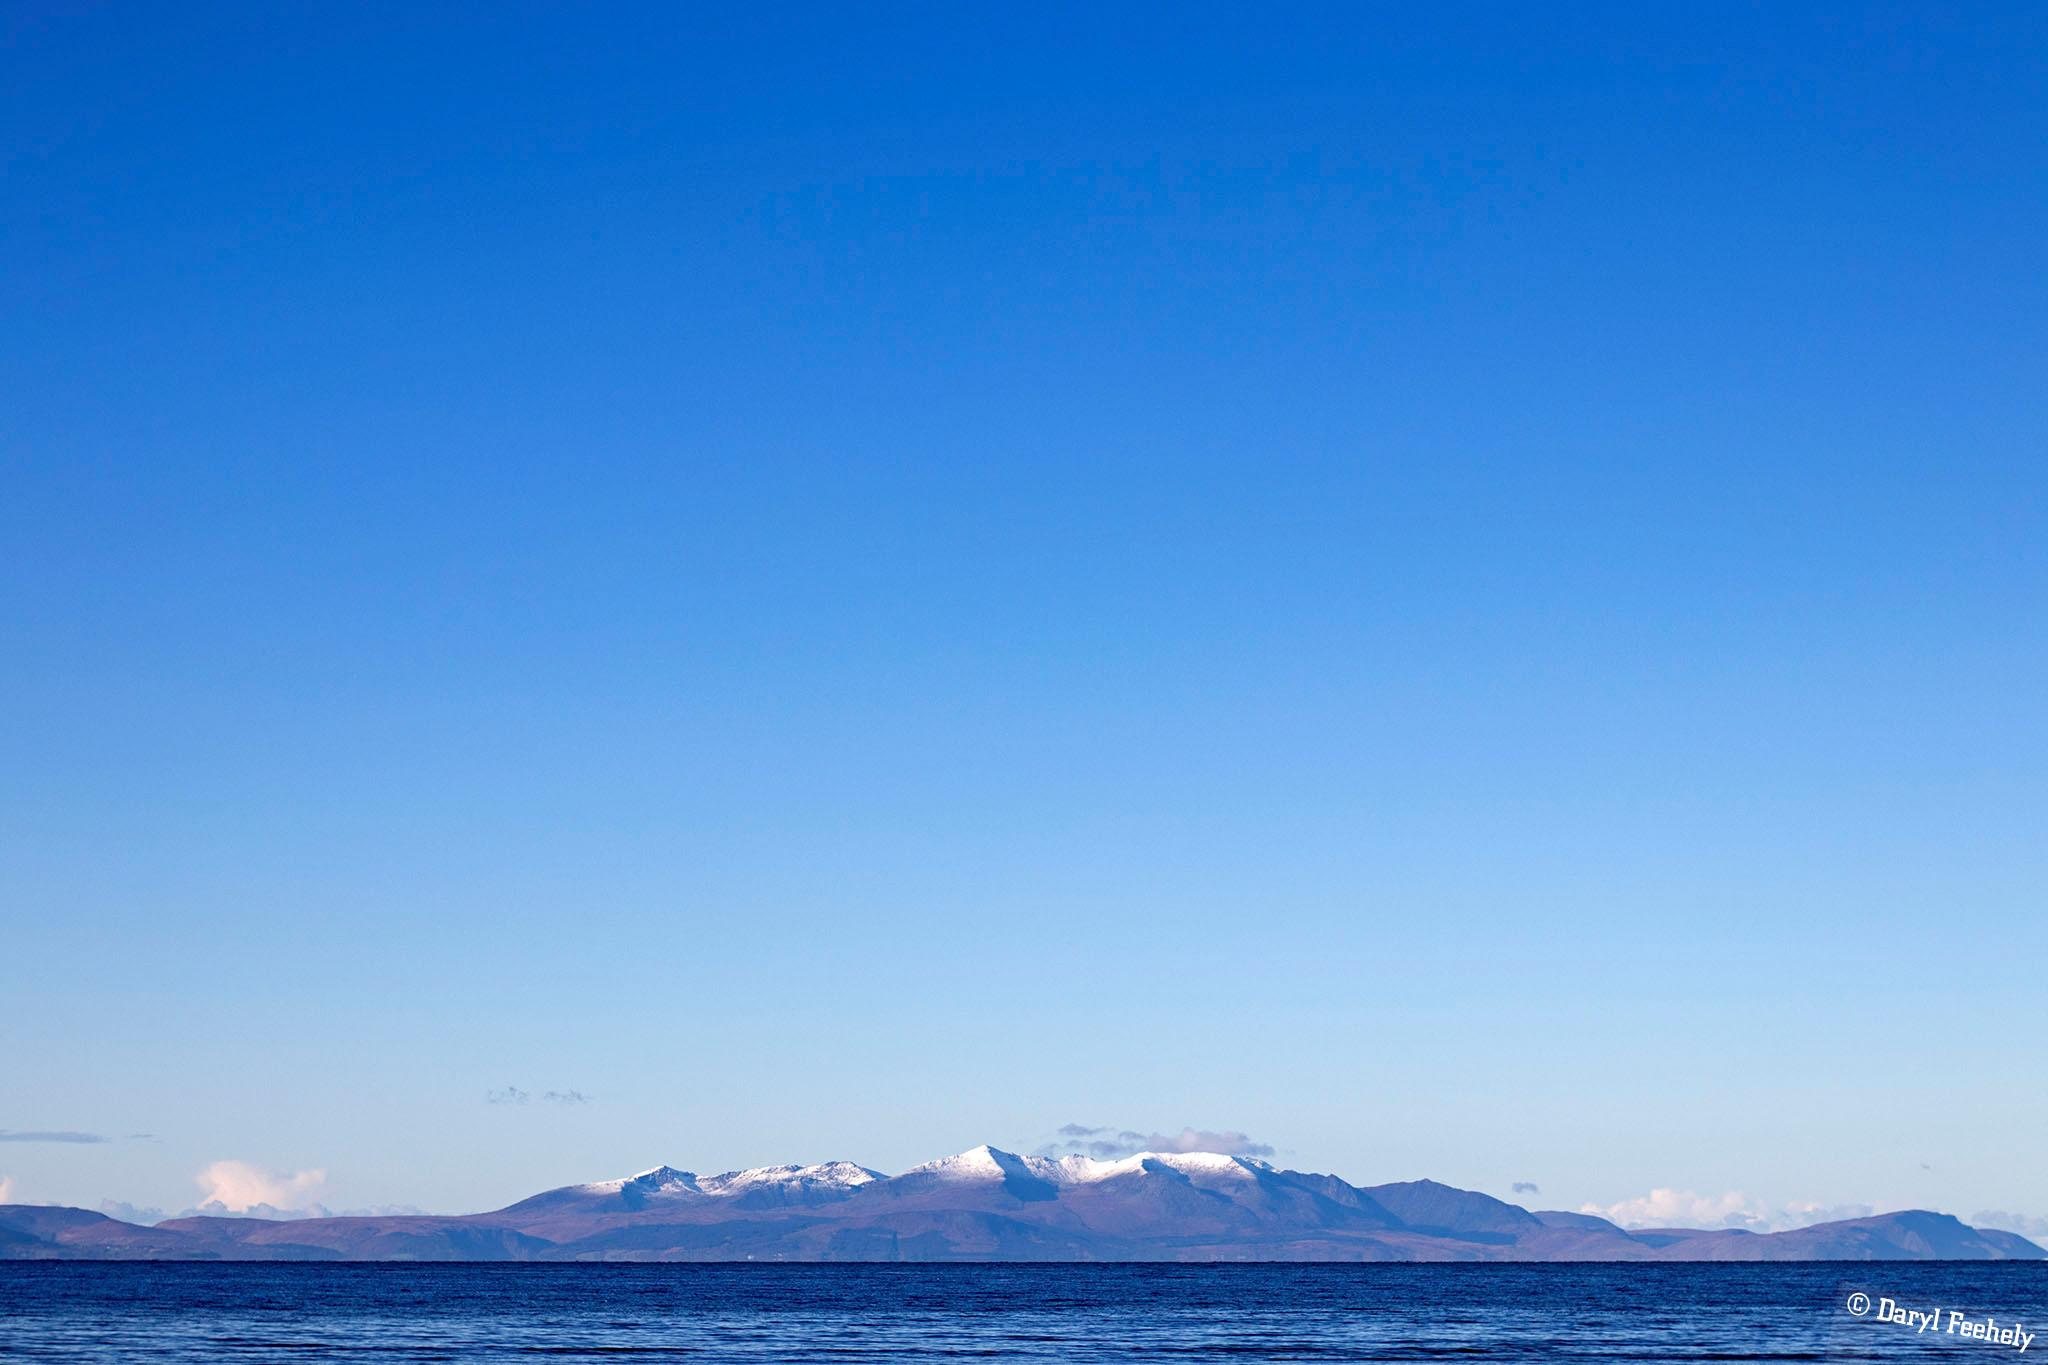 Snow Capped Isle of Arran